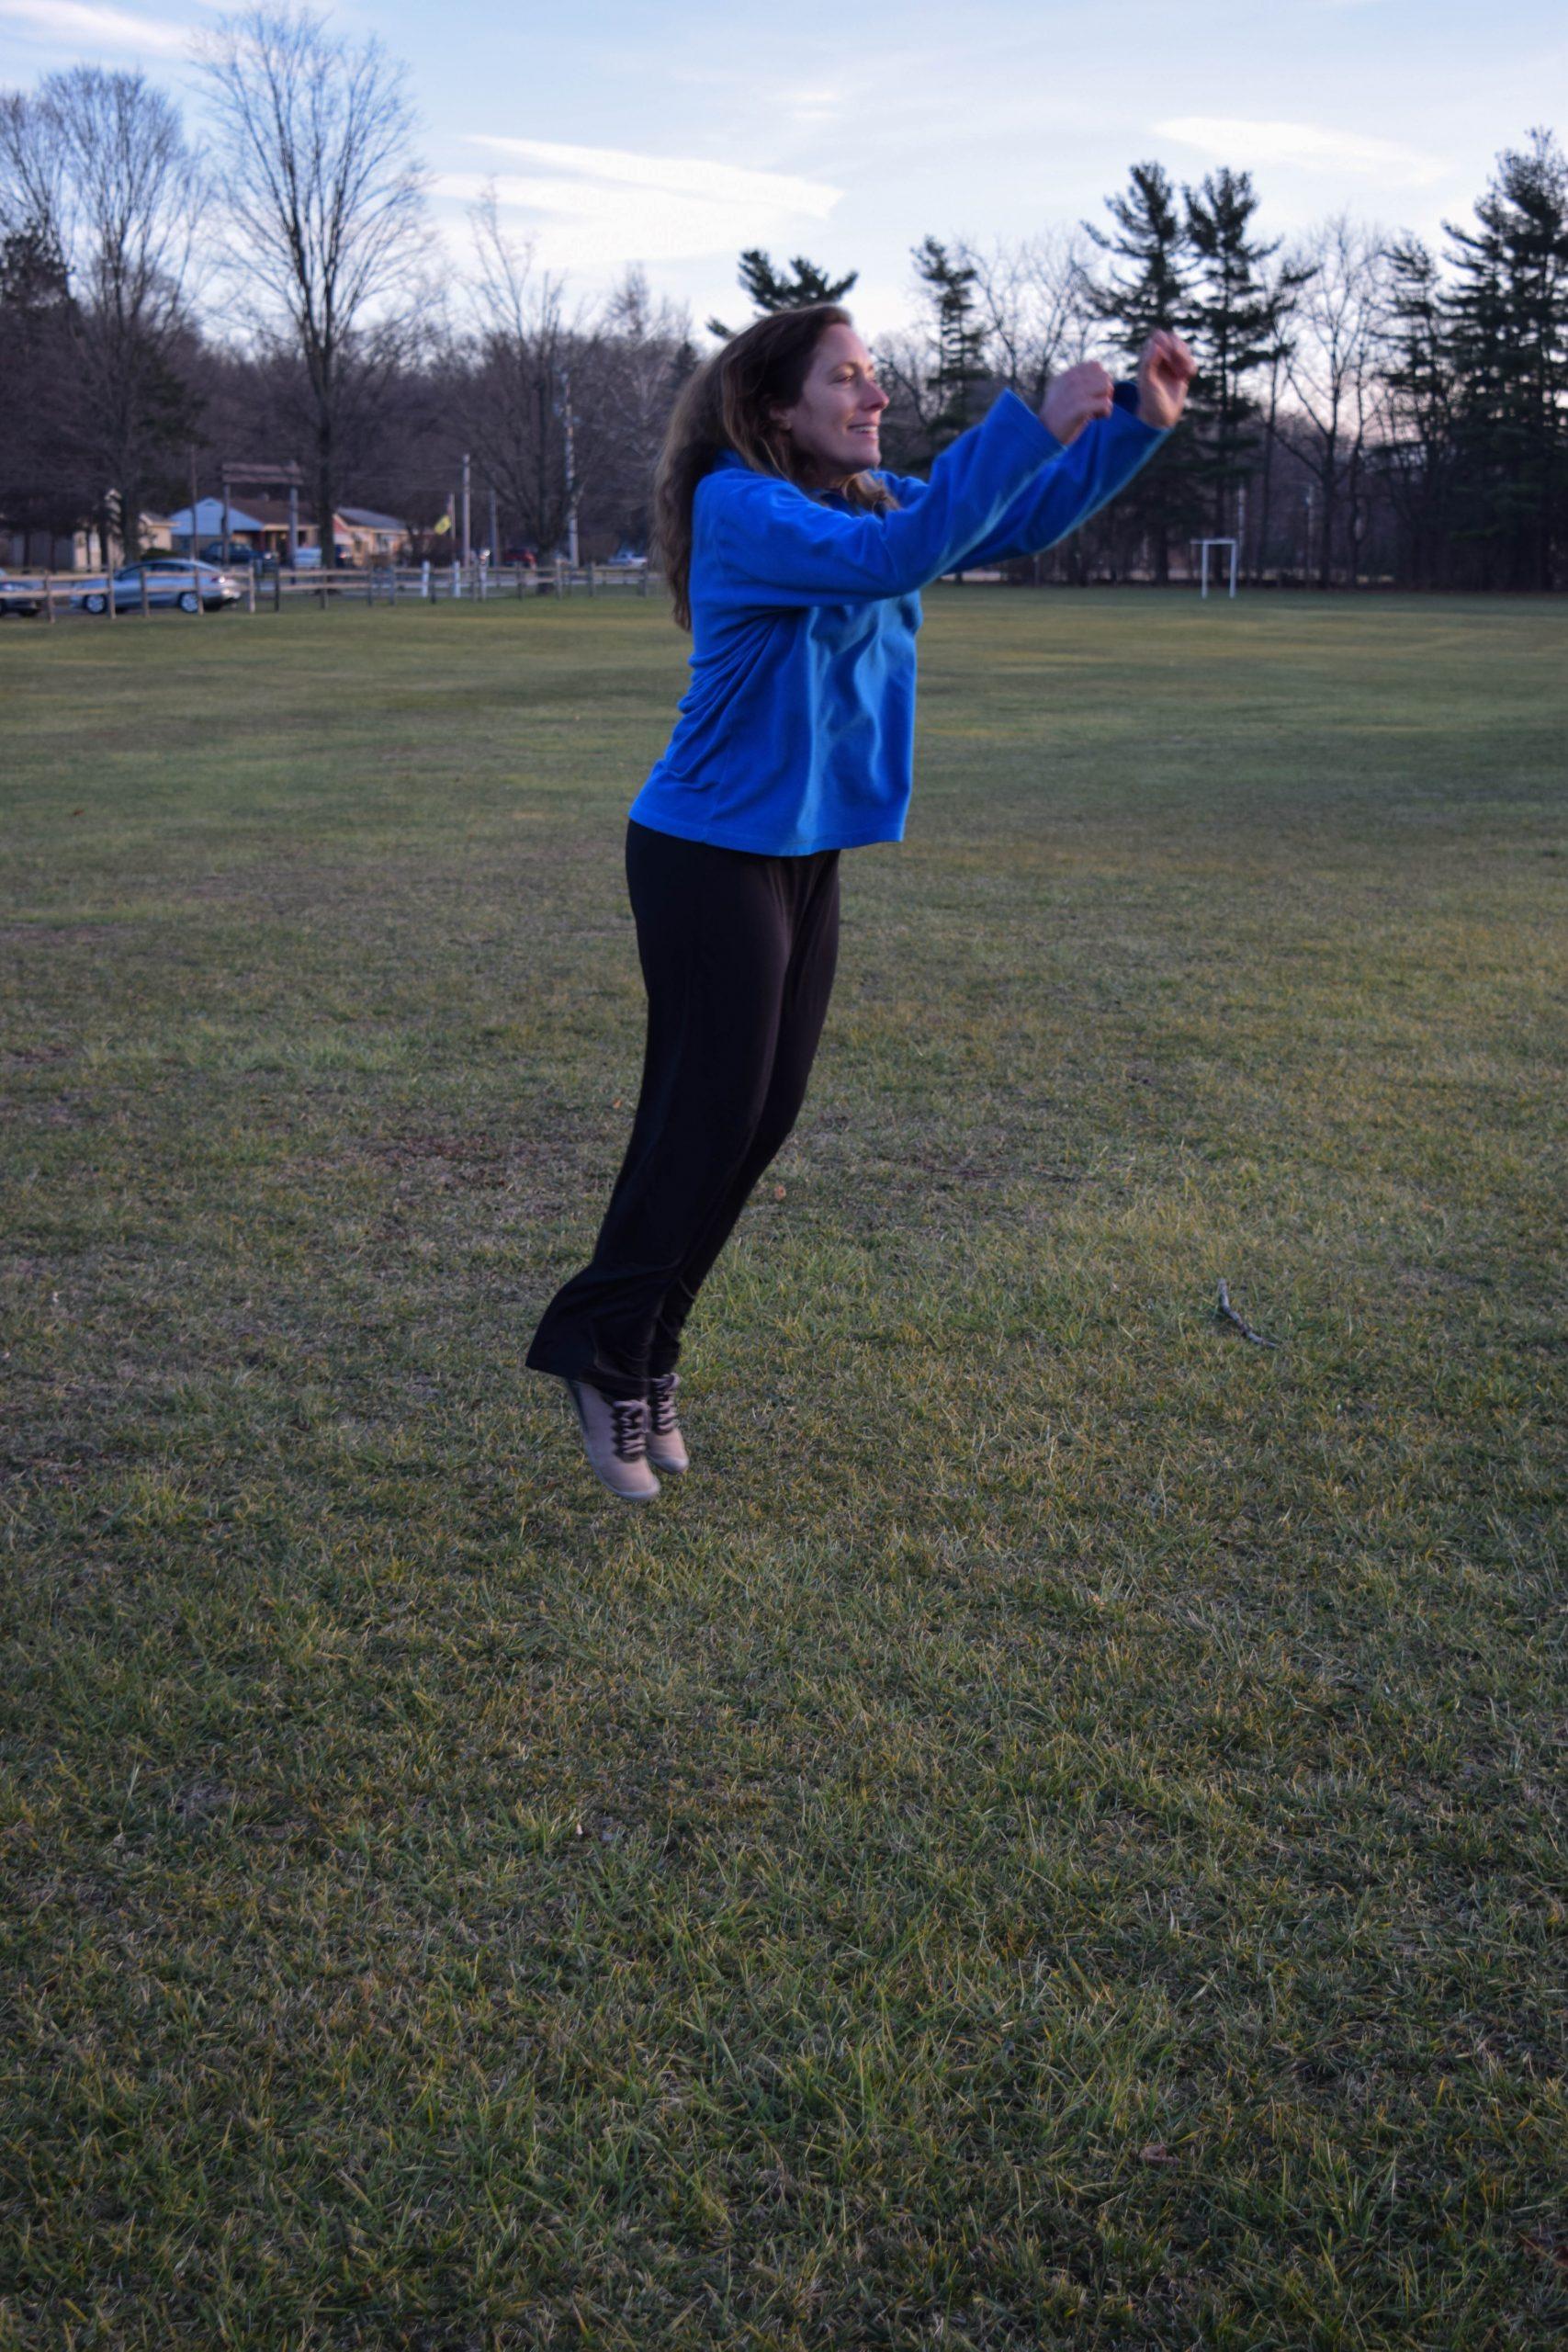 Linda jumping